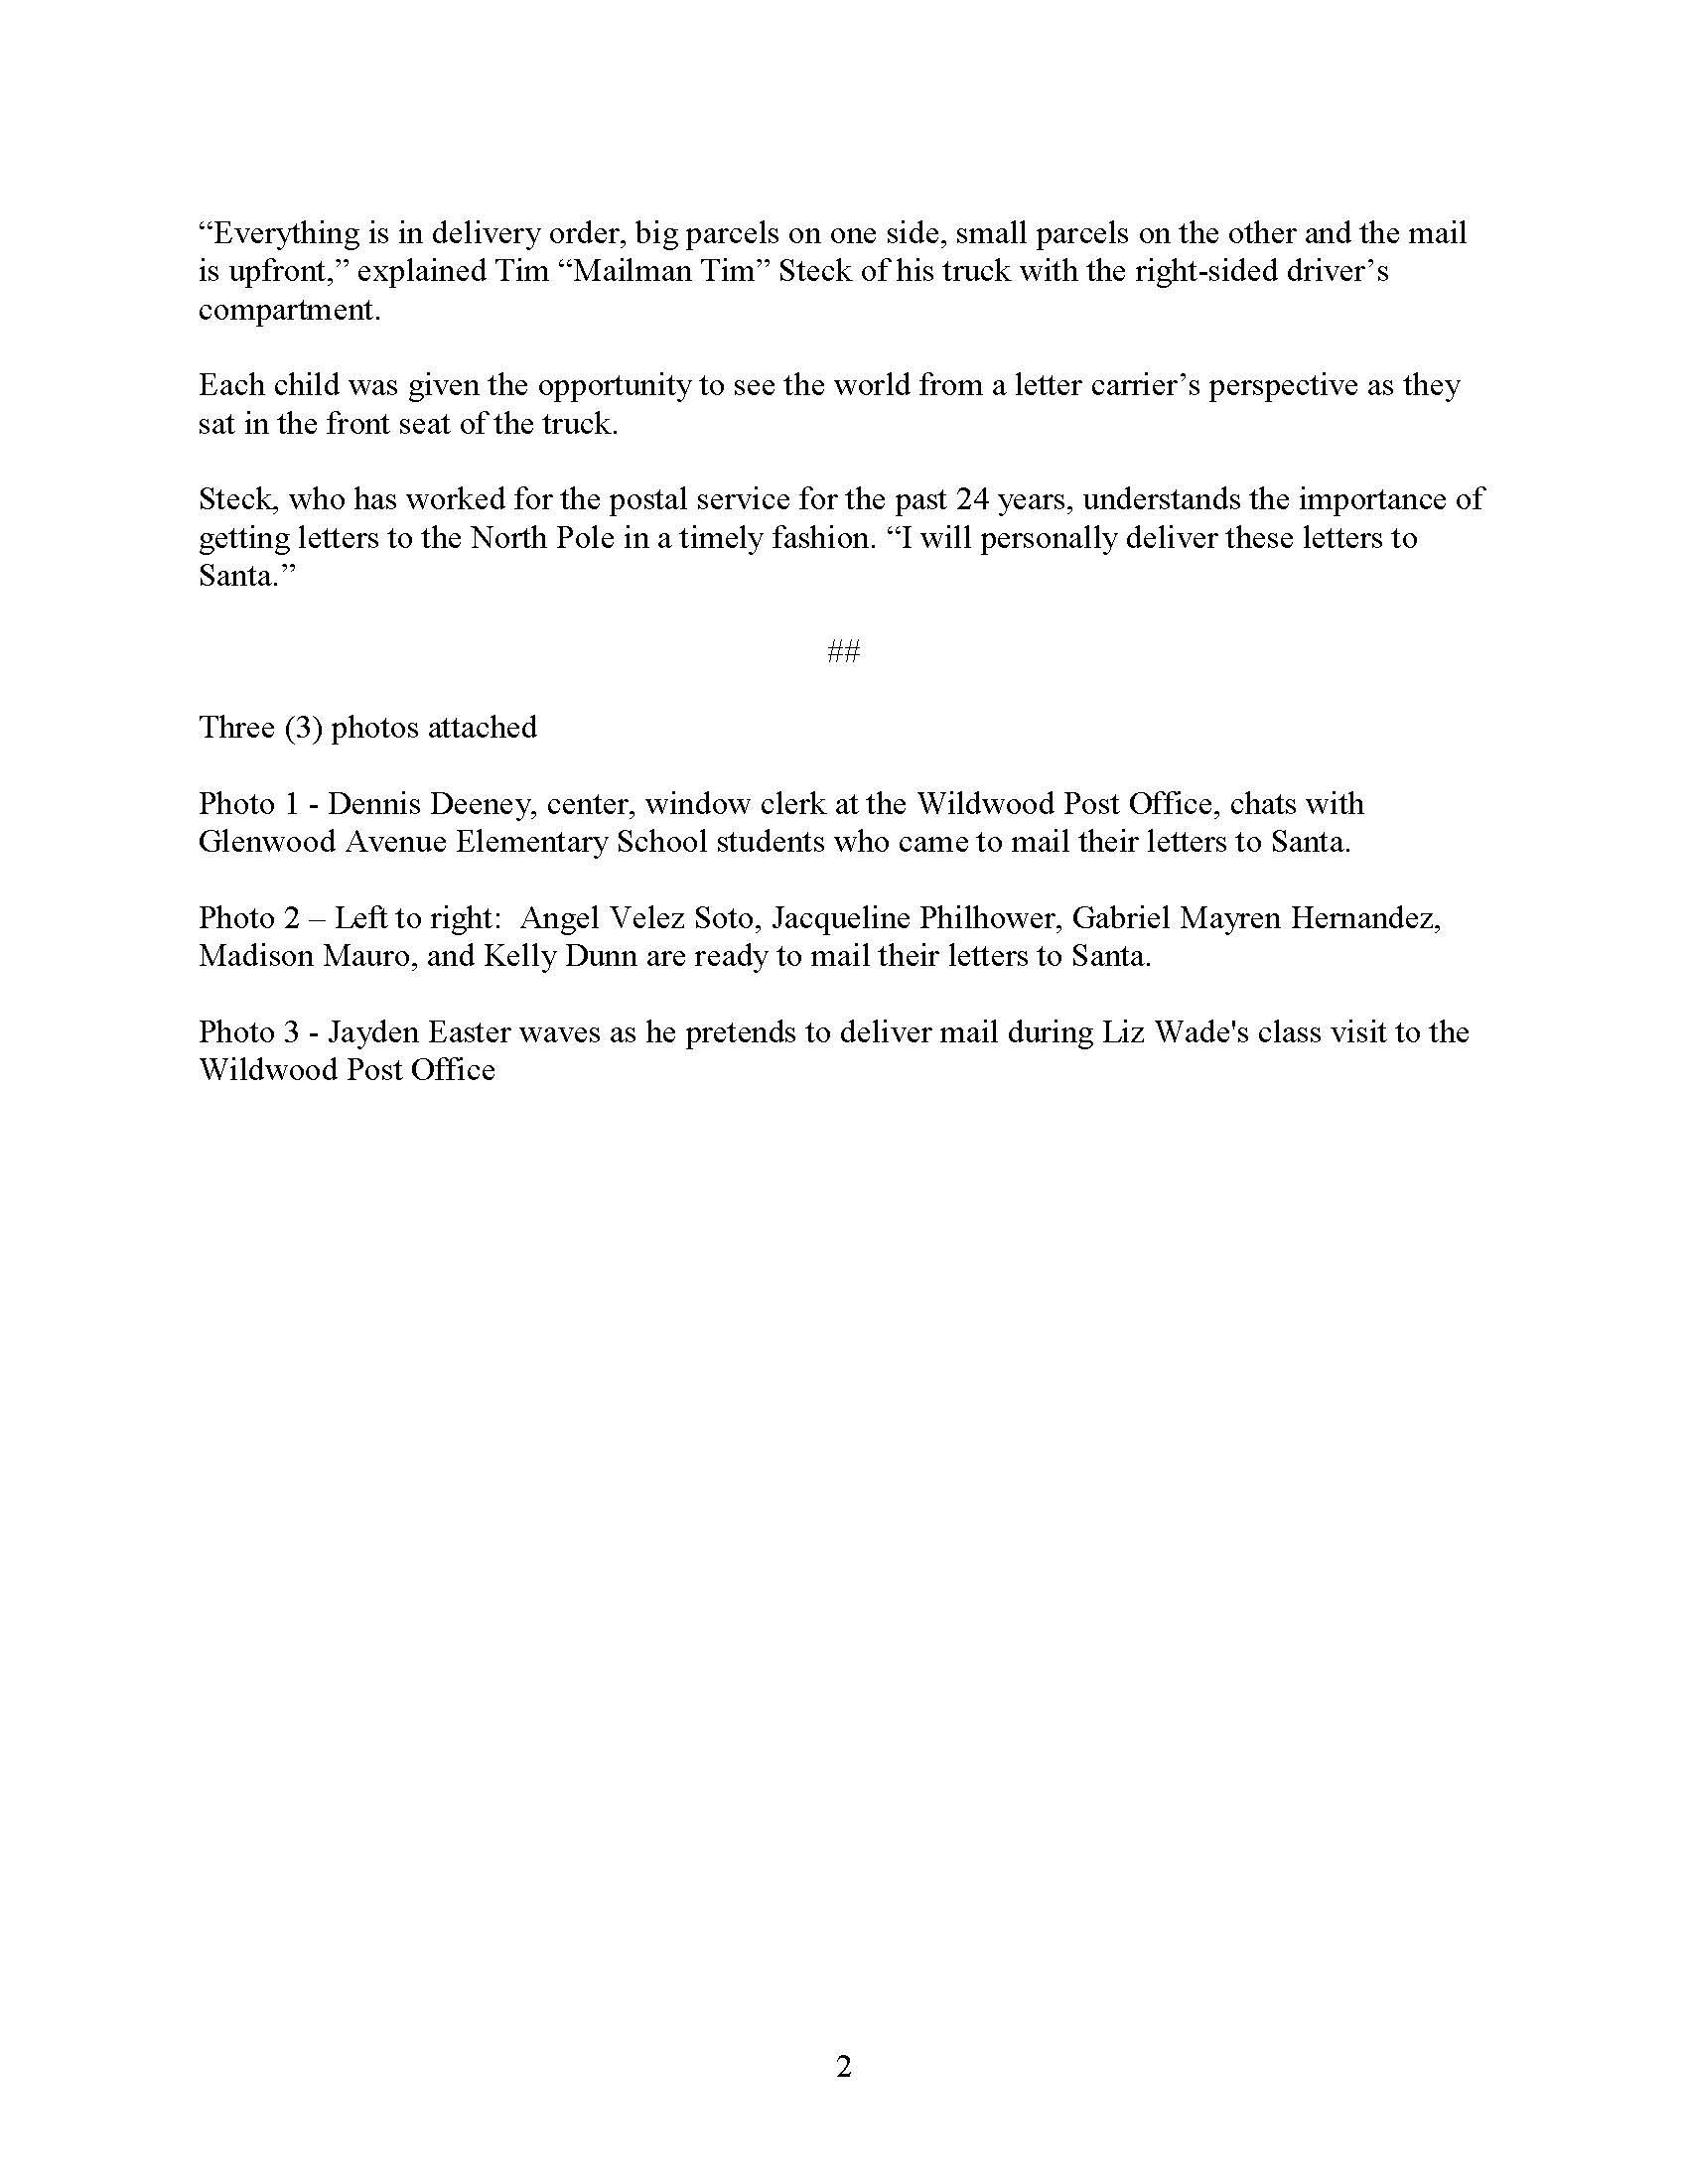 santa letter release-1_Page_2